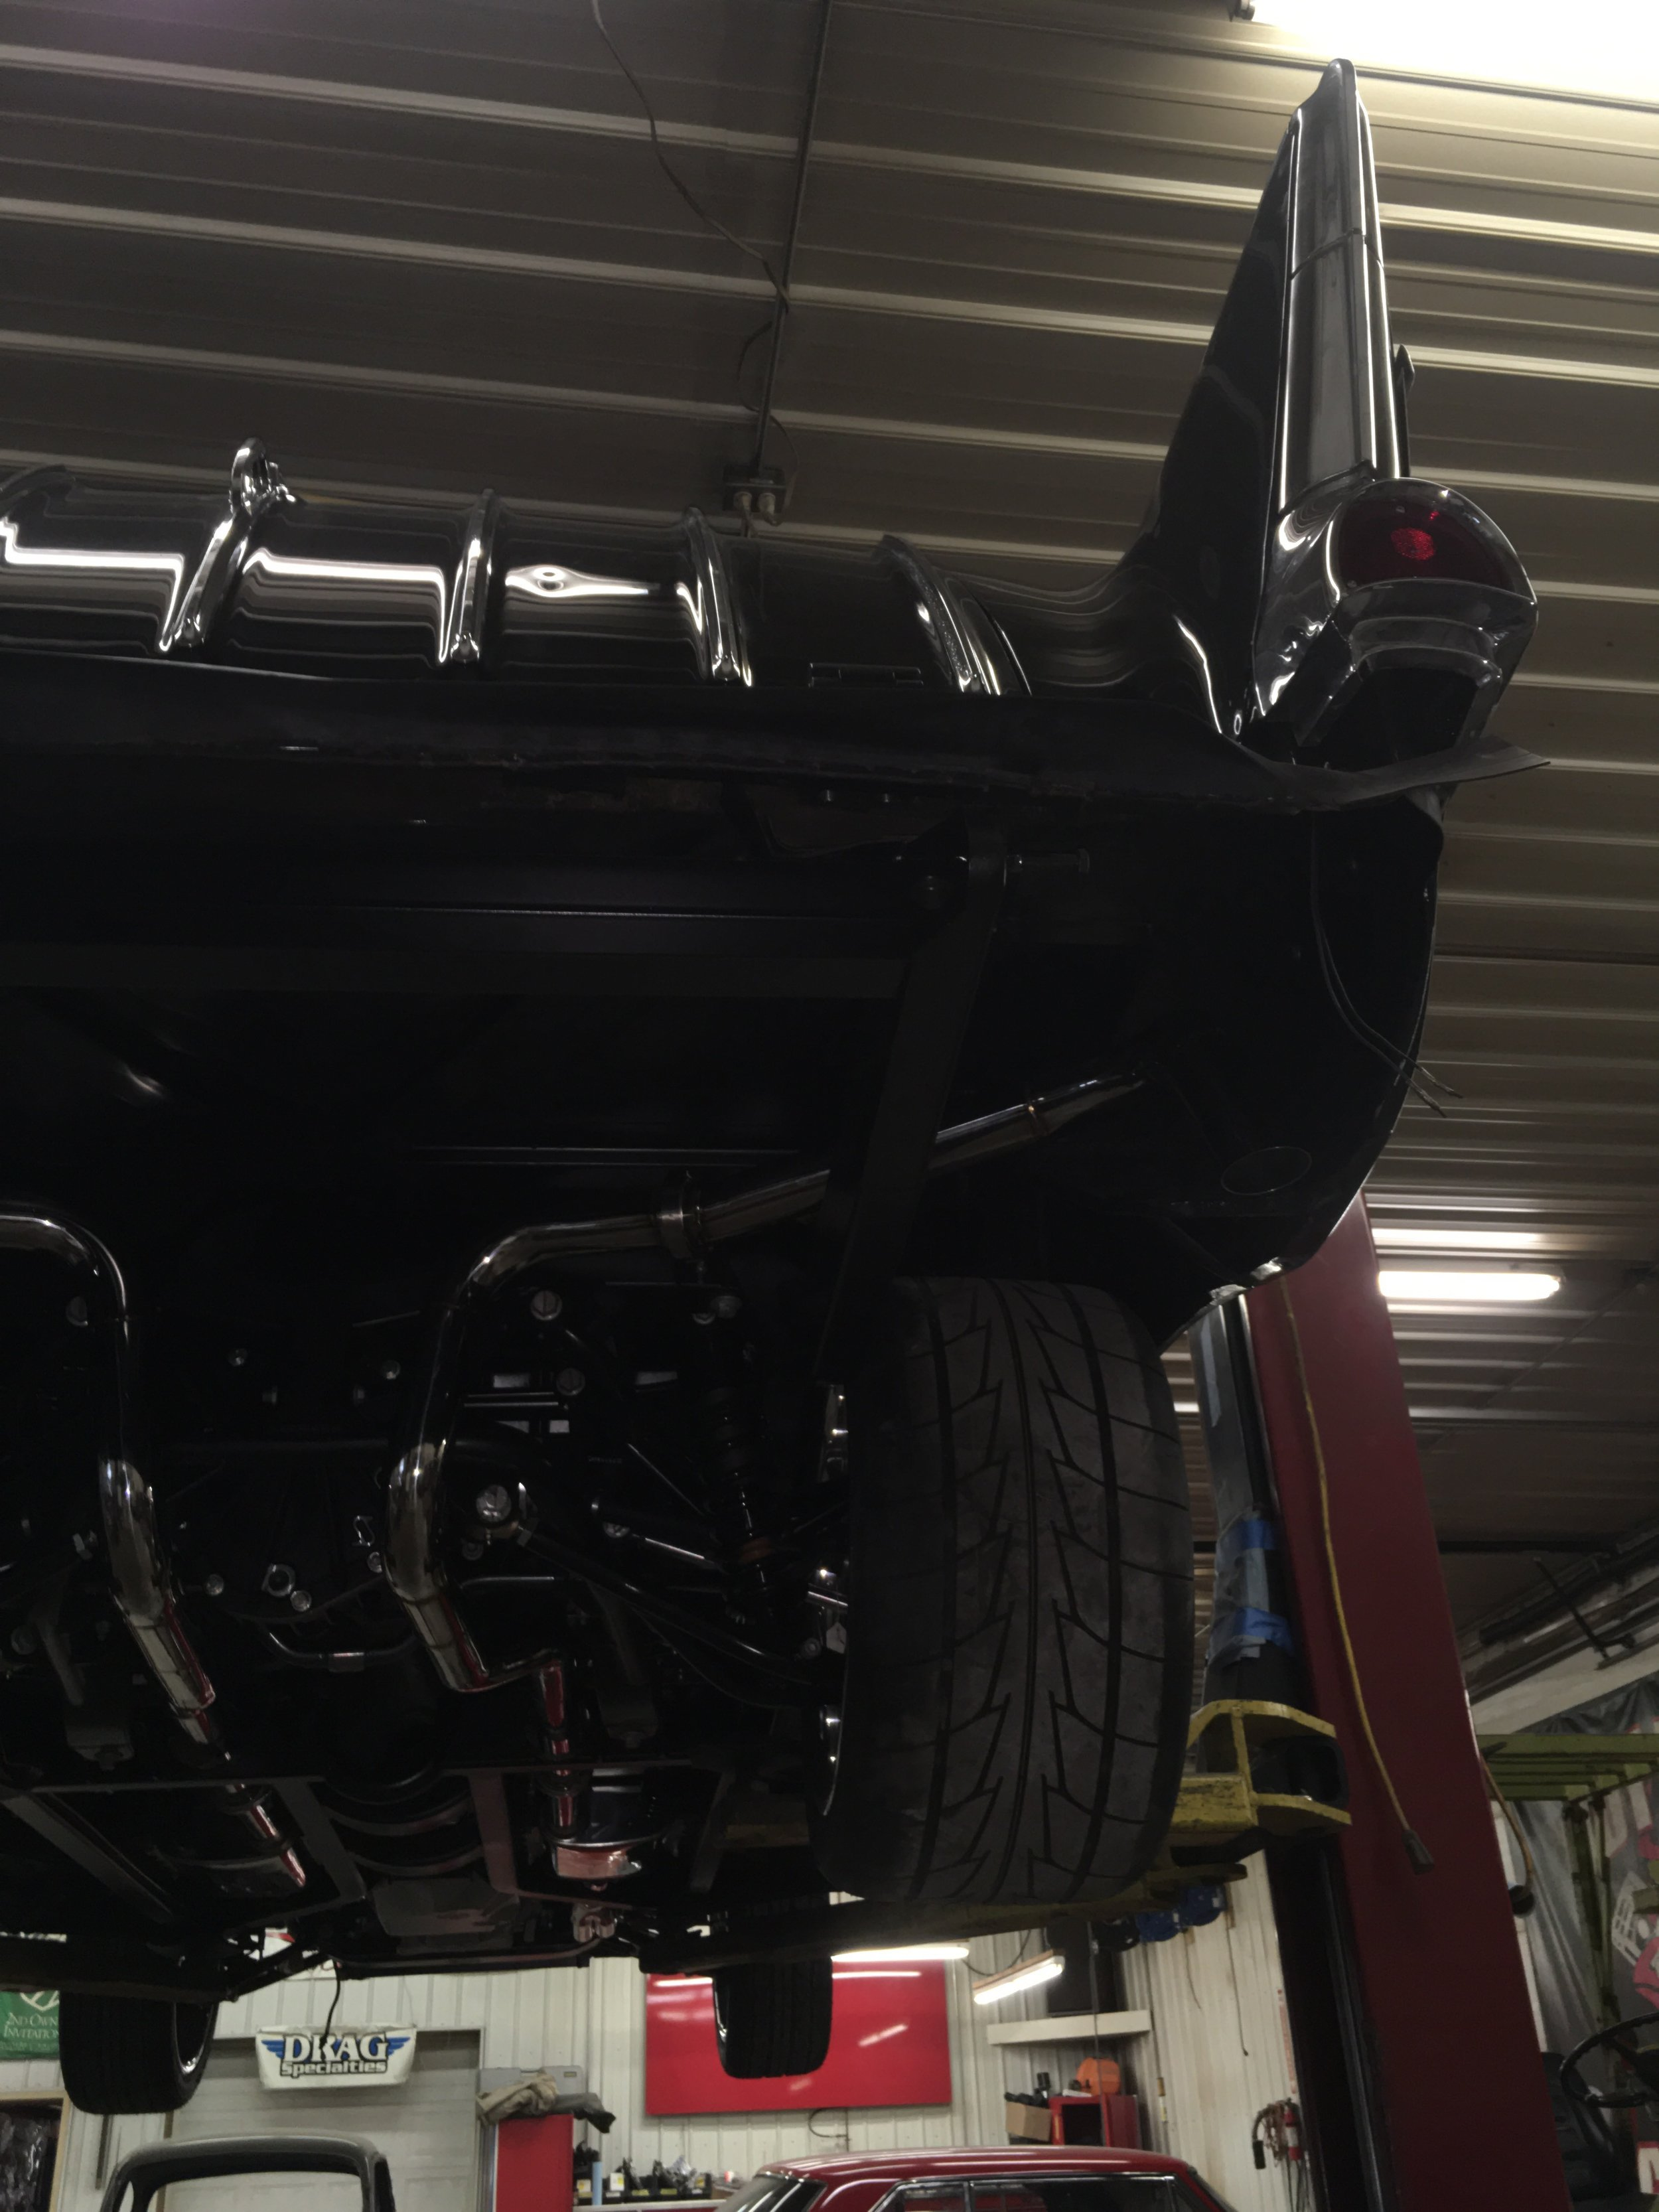 1957-Nomad-minneapolis-hot-rod-restoration-hot-rod-factory-exterior-trunk.jpg